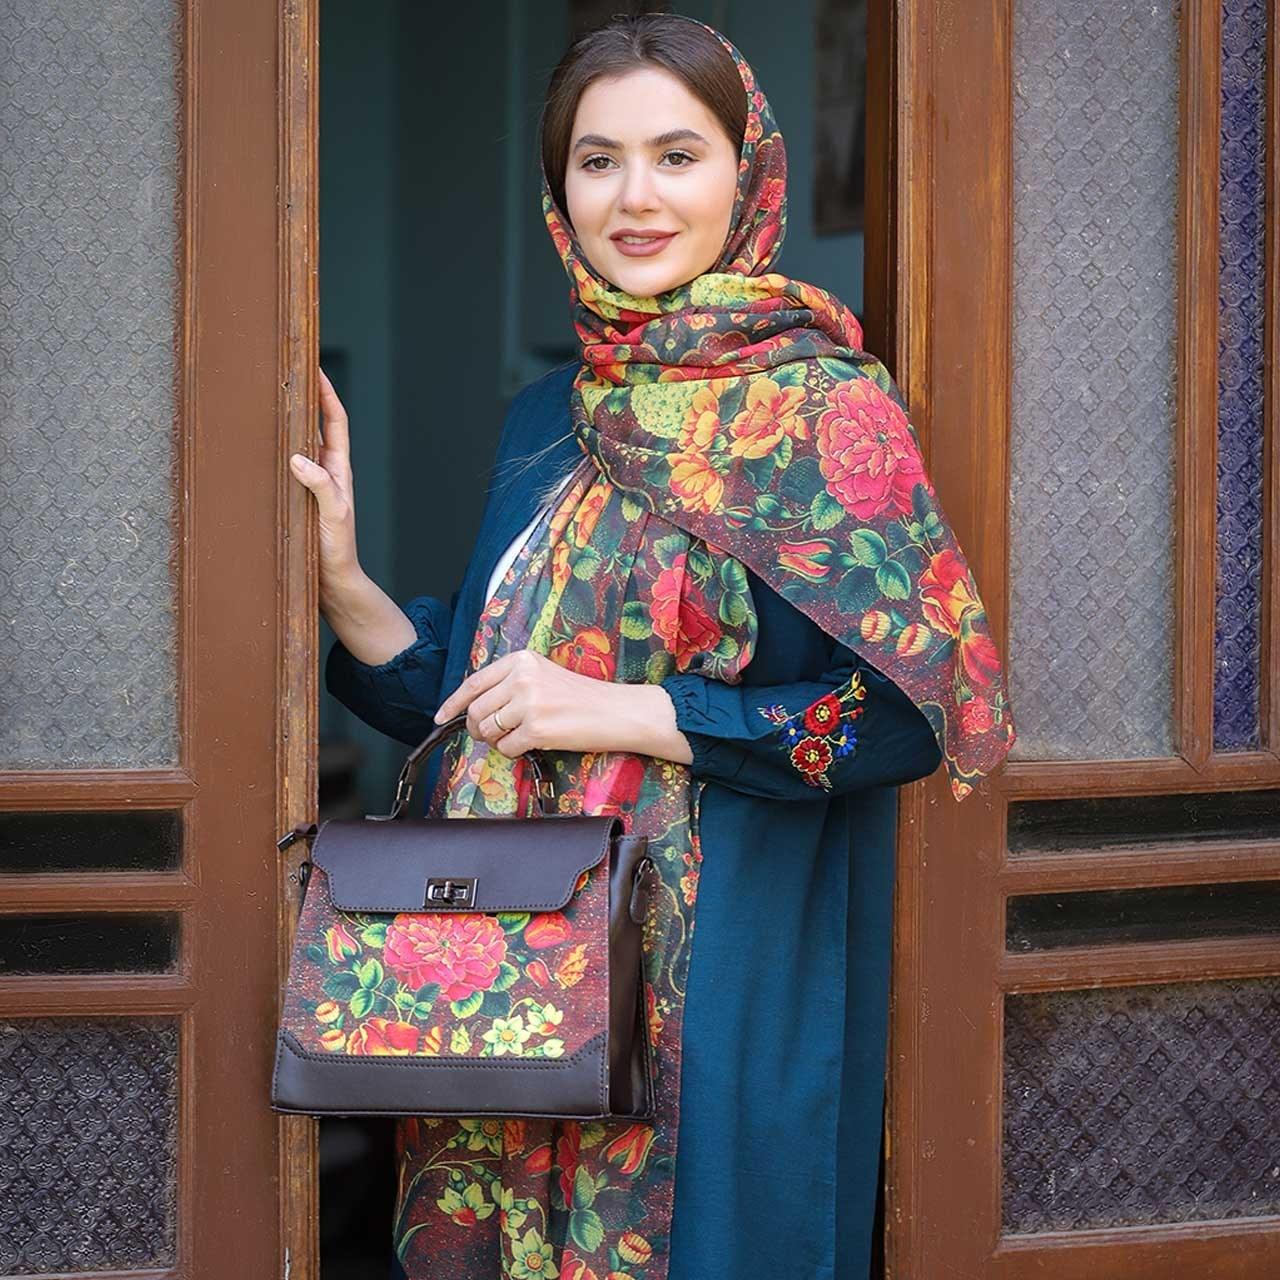 تصویر ست کیف و شال زنانه پیچک کد 10 ا Women  Bag  and  Shawl  Set Code 10 Women  Bag  and  Shawl  Set Code 10